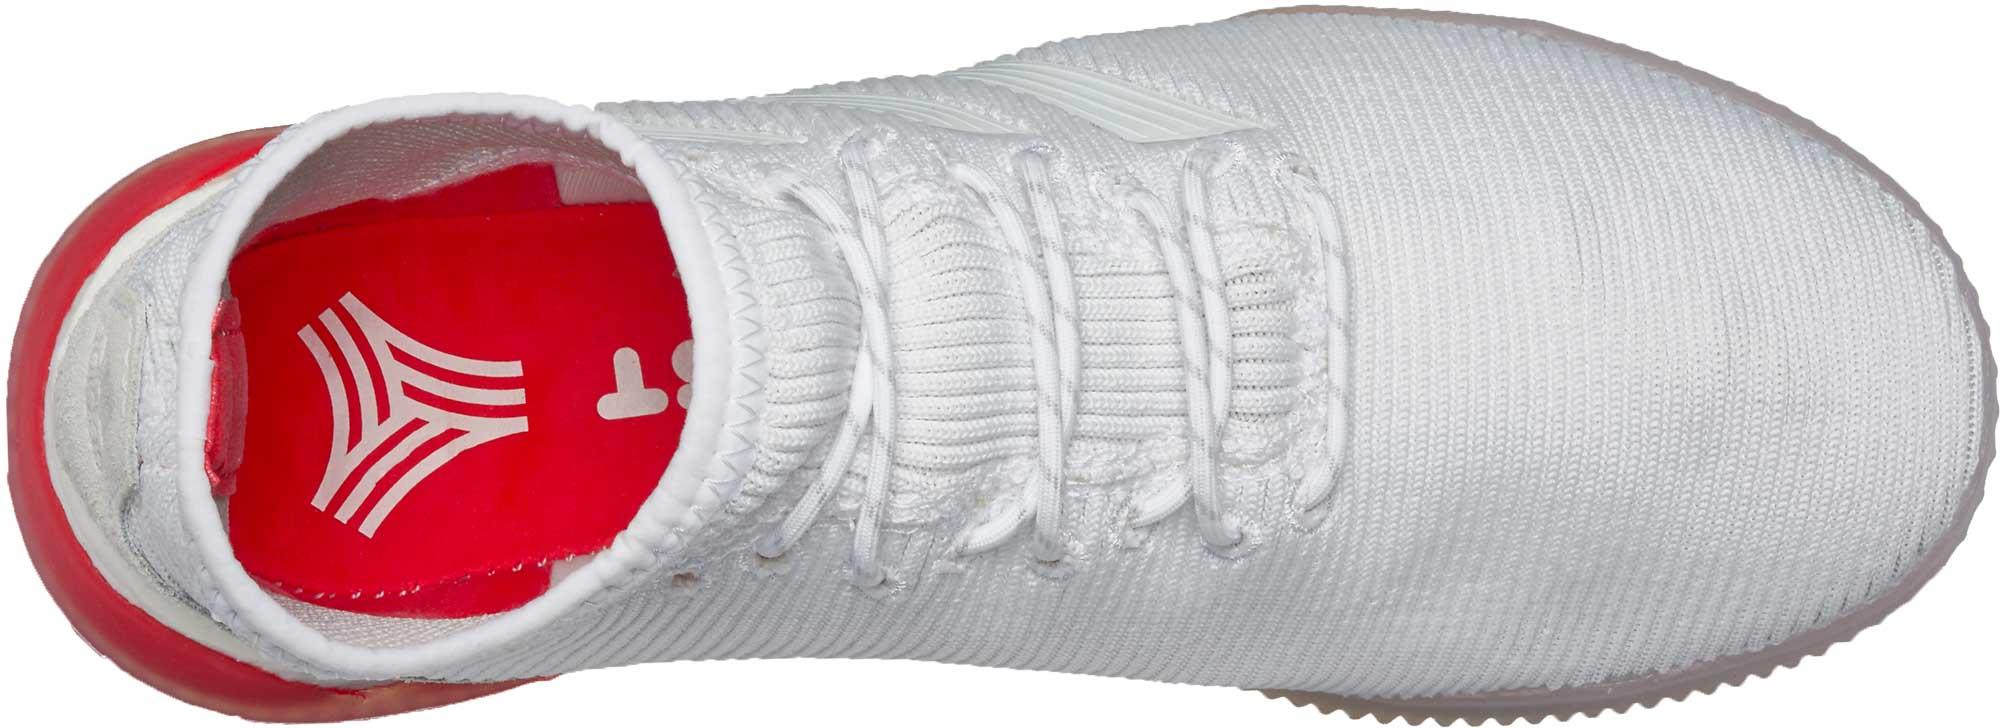 3c5d2c4e801e adidas Predator Tango 18.1 TR - White & Real Coral - Soccer Master